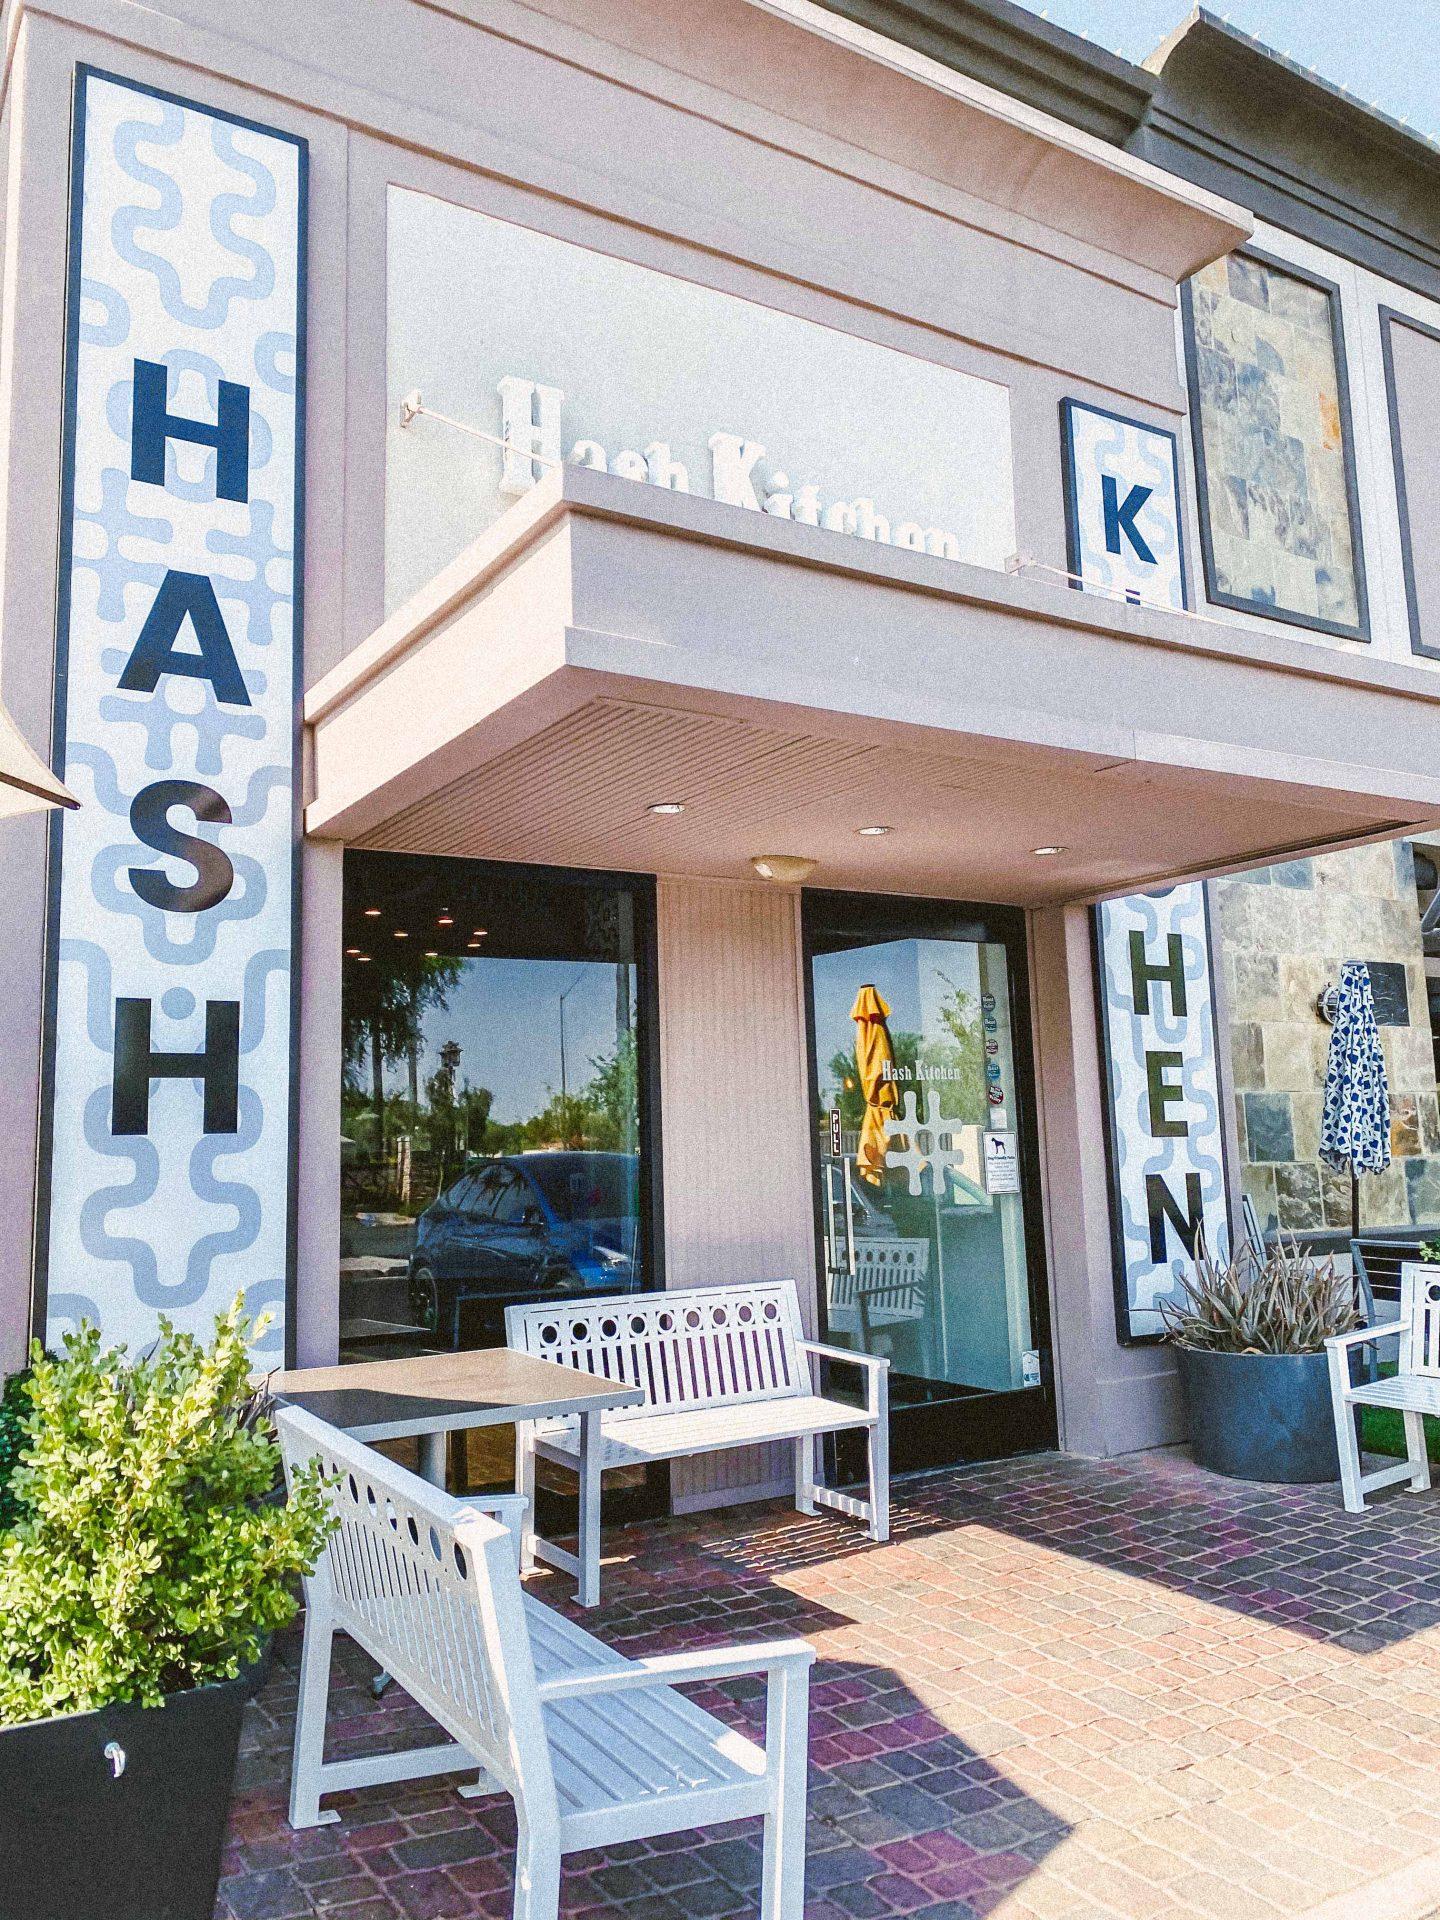 hash kitchen scottsdale Arizona, best brunch spots scottsdale, where to eat scottsdale, cannoli donuts, açaí bowls, healthy breakfast, gluten free, where to eat, scottsdale travel Guide, best of scottsdale, scottsdale experience, what to do in scottsdale, travel blogger